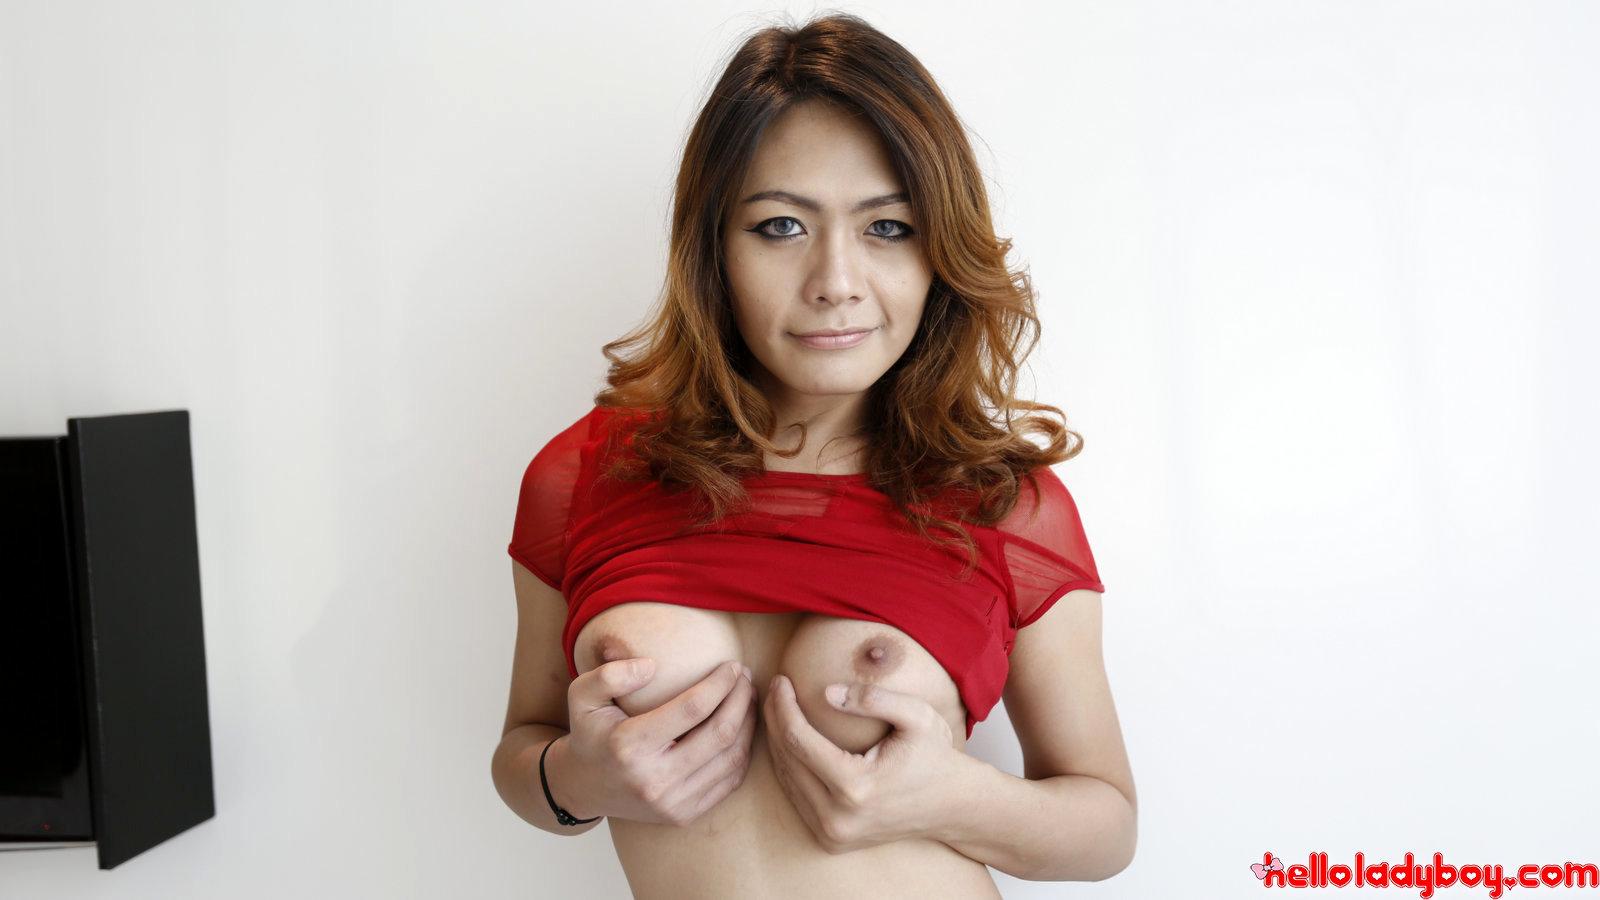 26 Year Old Asian Tranny Sucks Off Tourist Tool